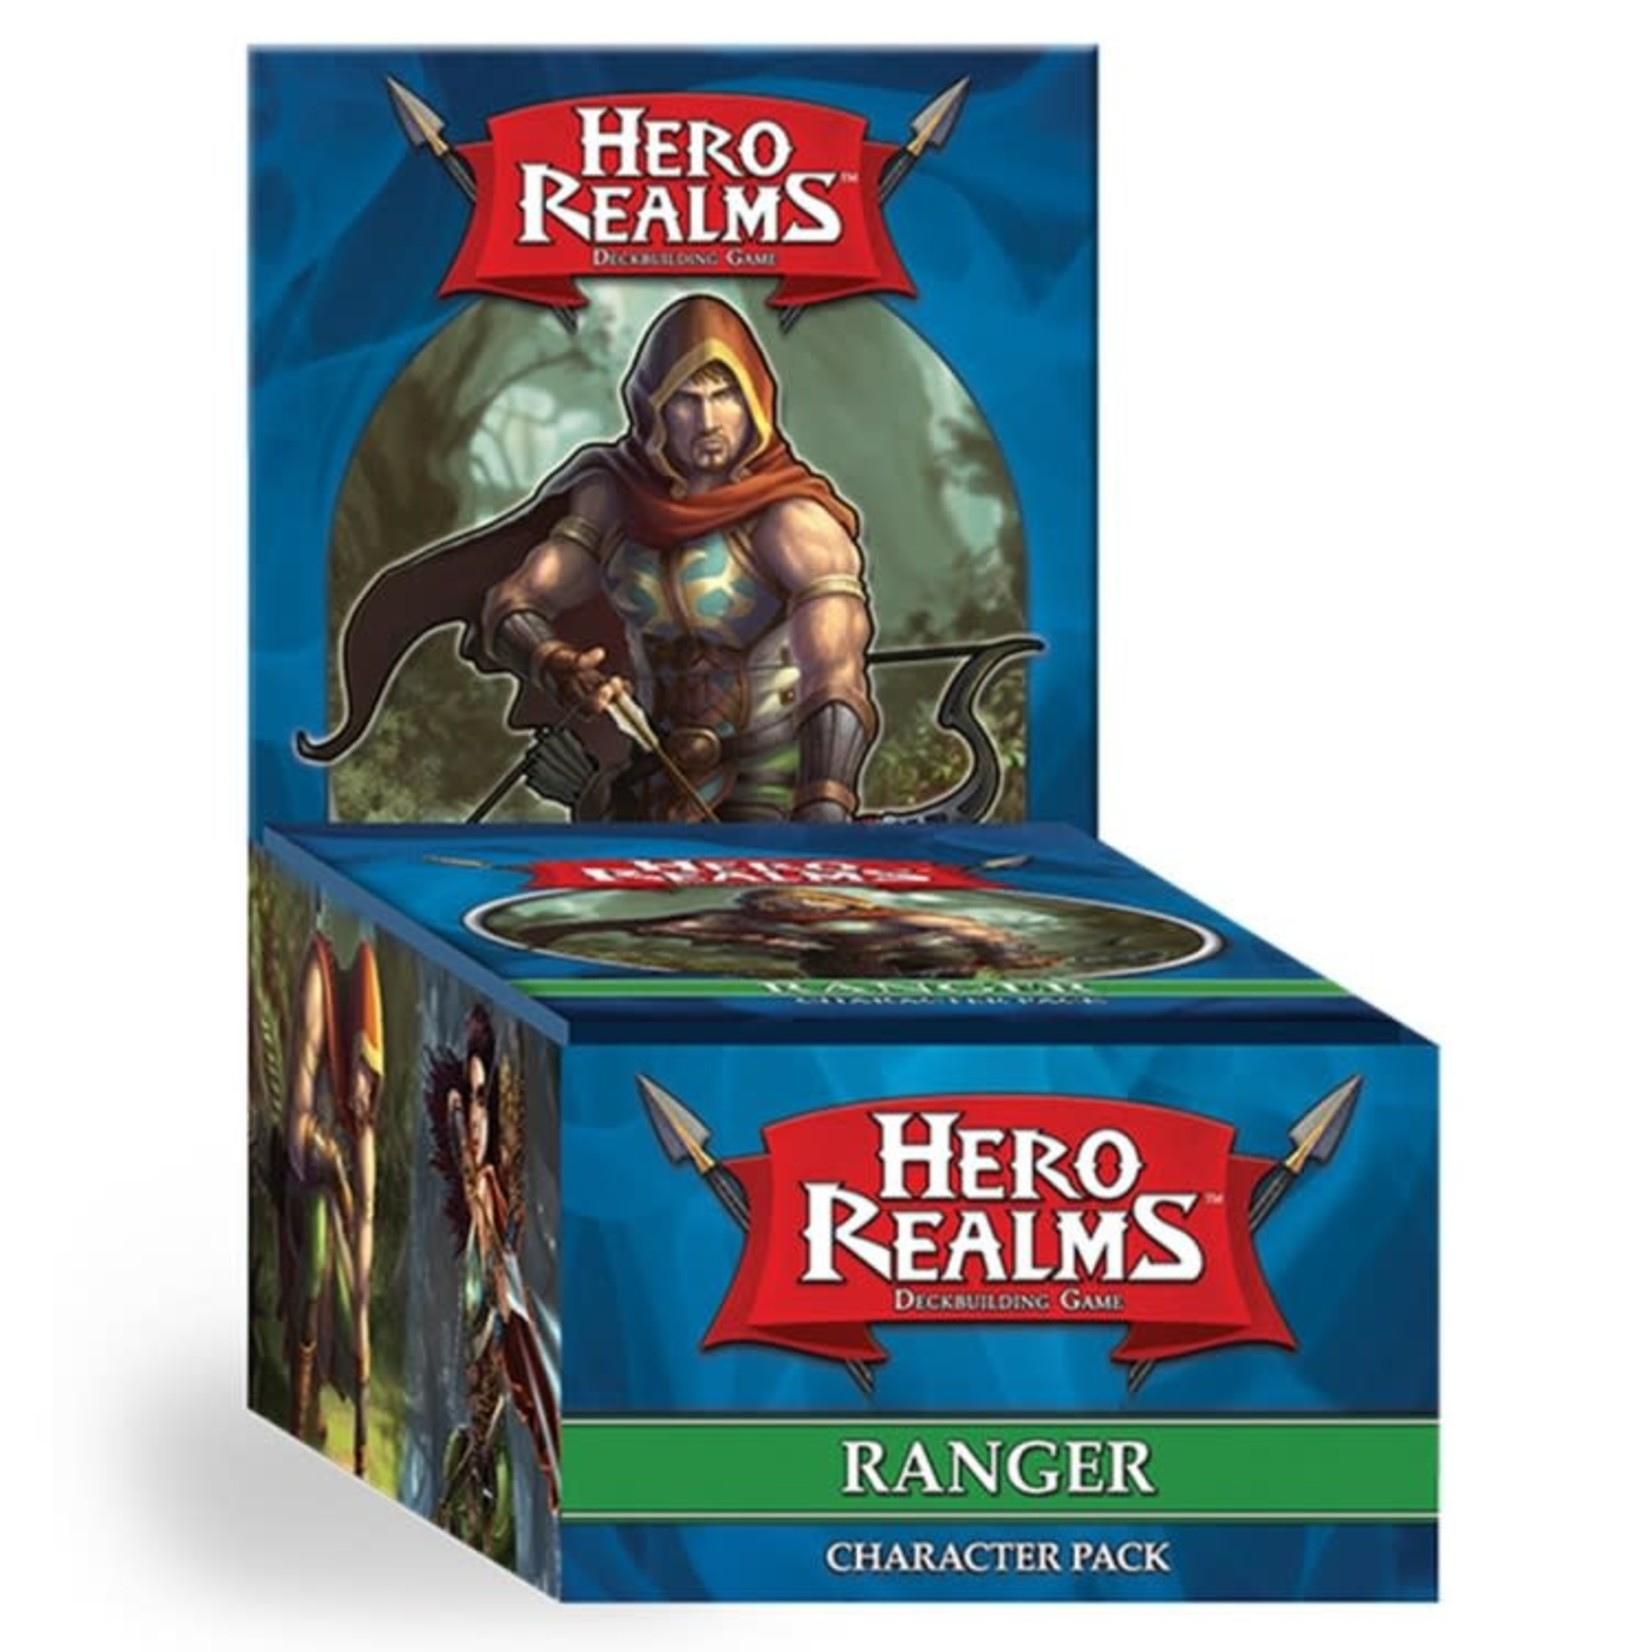 White Wizard Games Hero Realms Deckbuilding Game: Ranger Expansion Pack